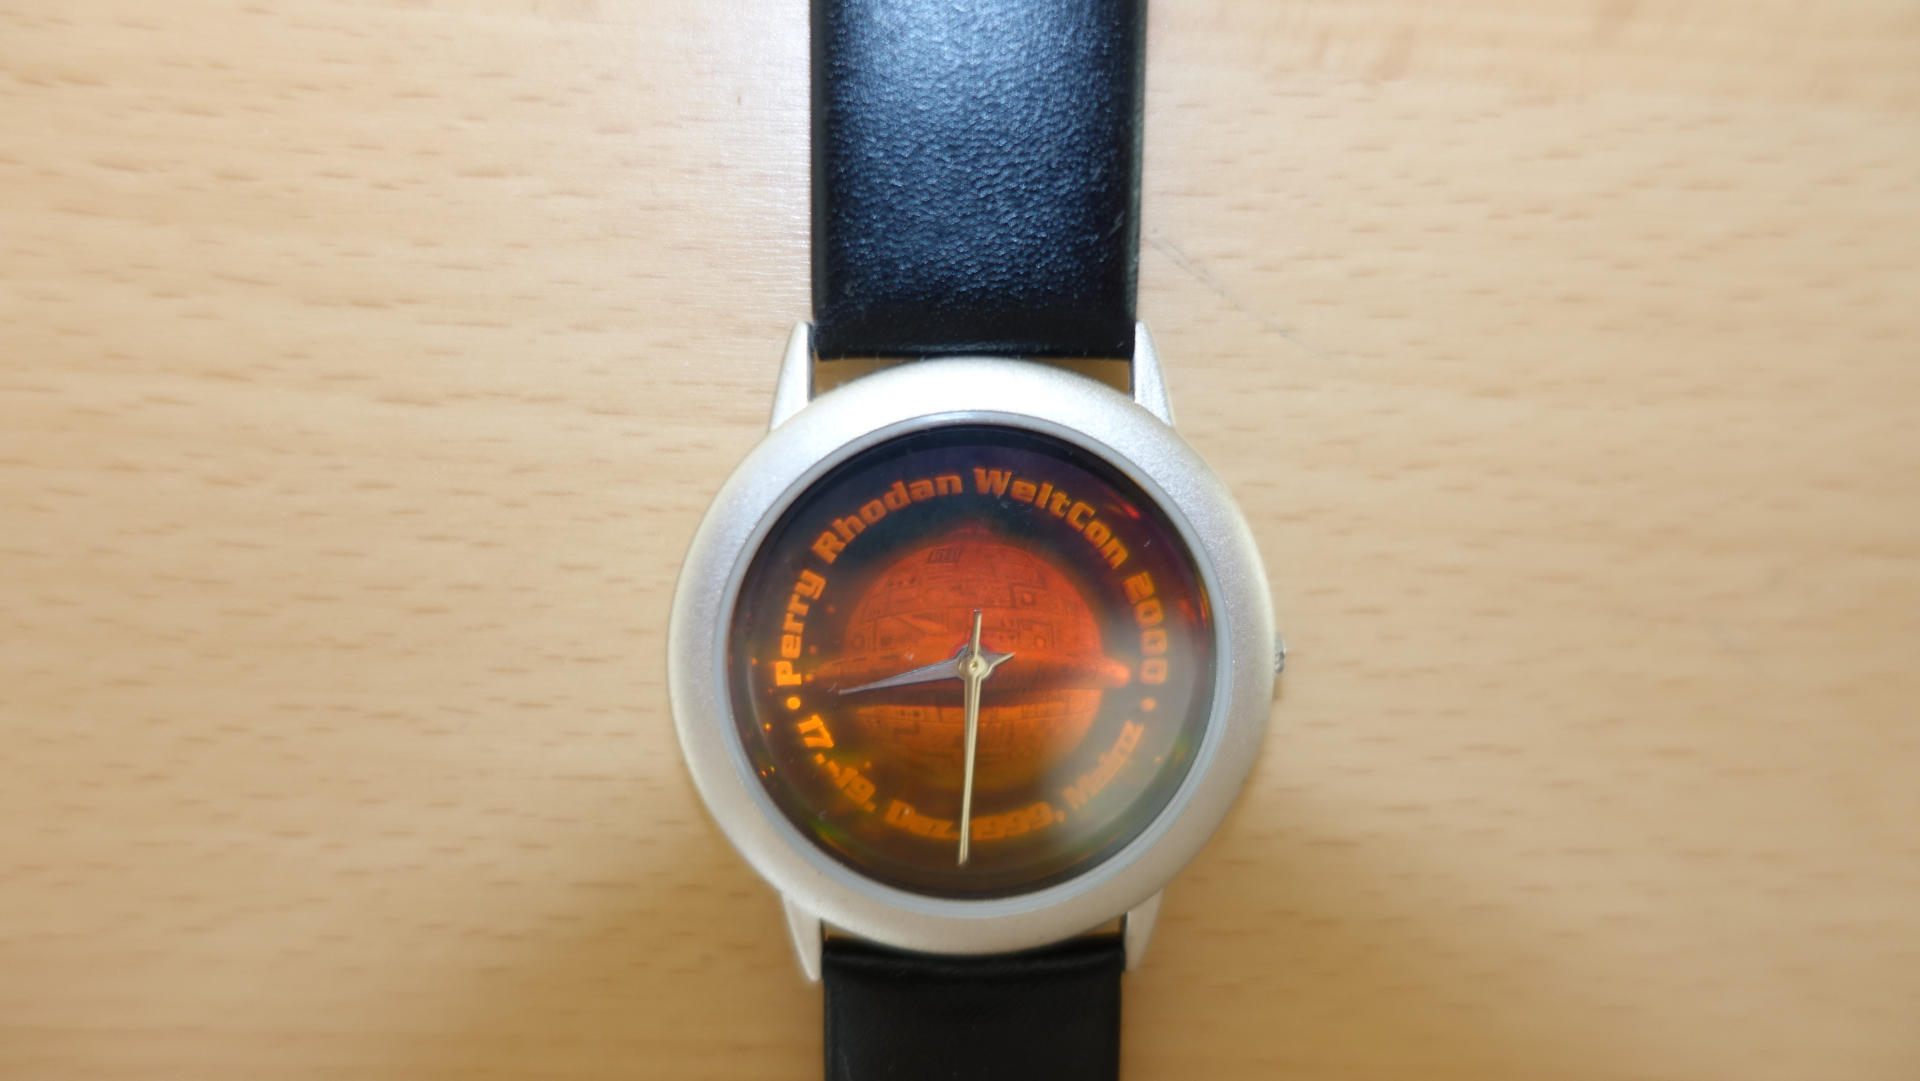 Perry Rhodan Uhr Weltcon 2000